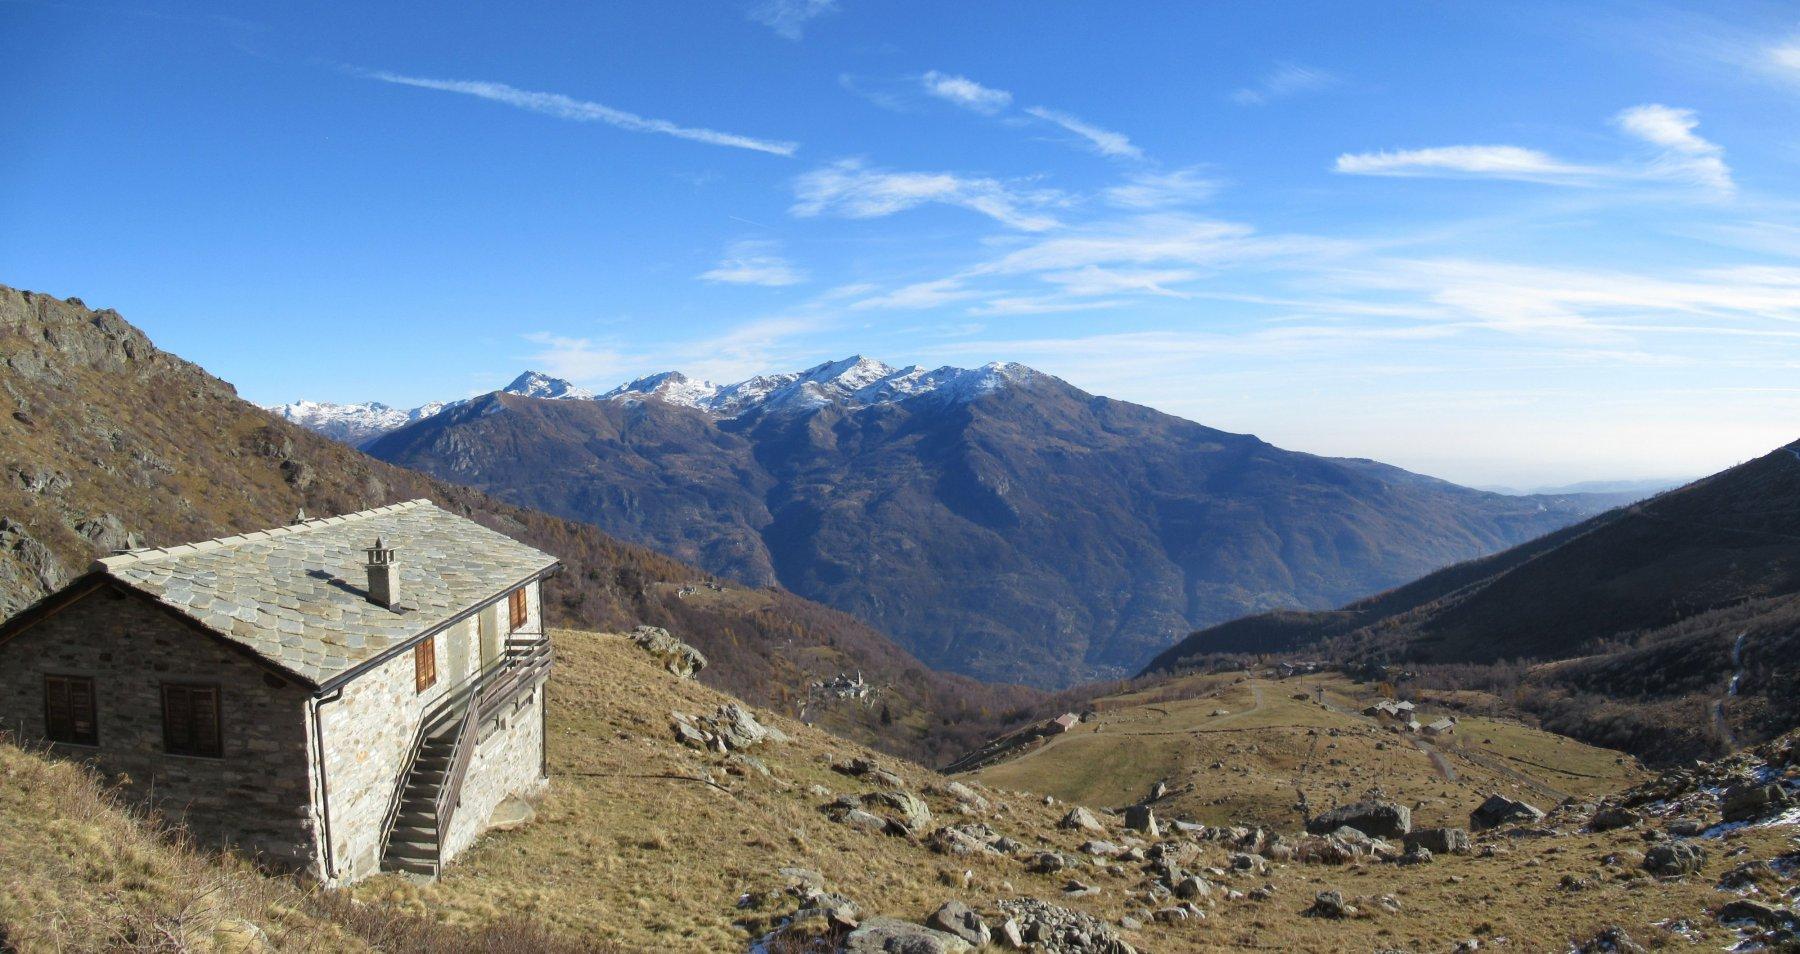 Alpe Cavanna Nuova